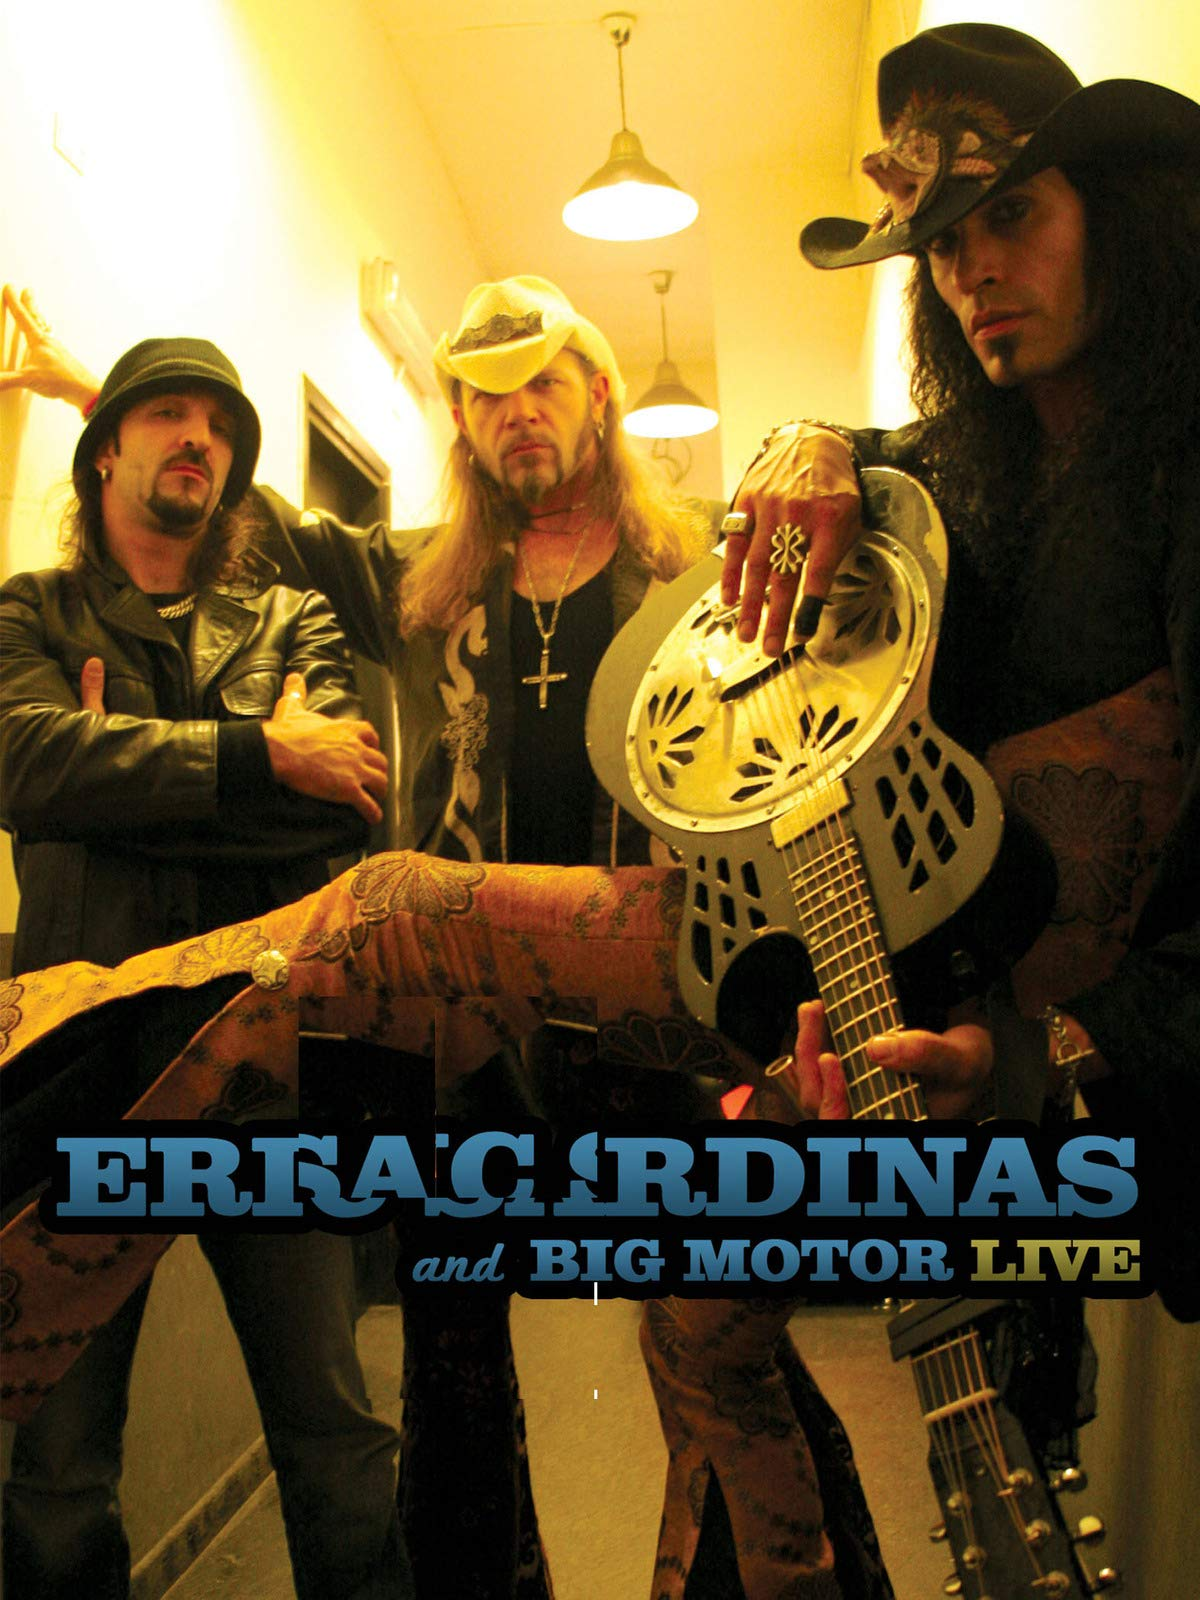 Eric Sardinas and Big Motor - Live on Amazon Prime Video UK